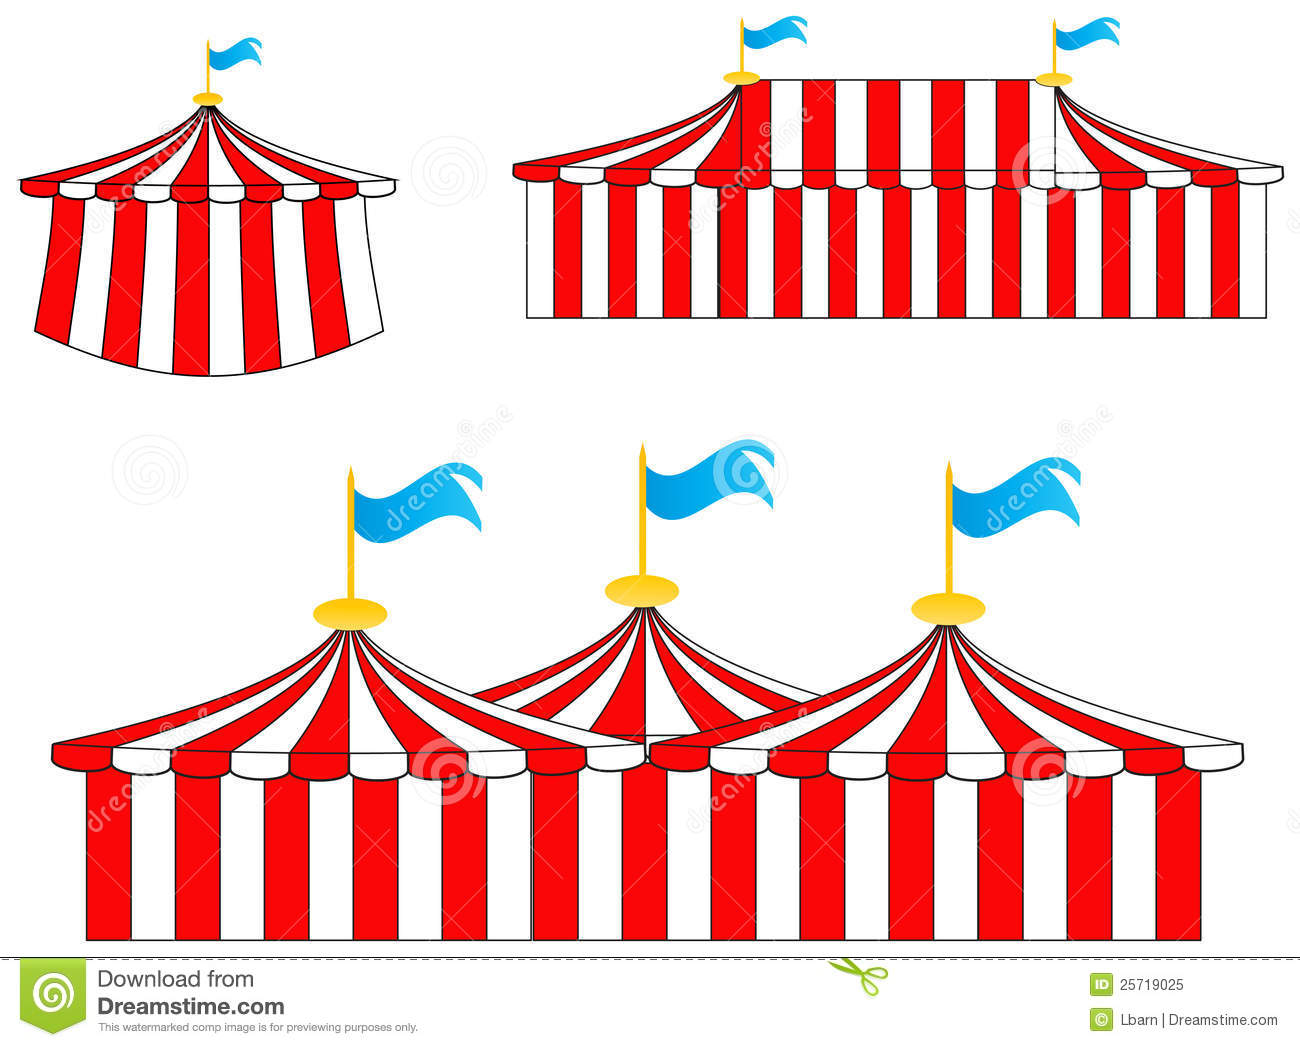 Carneval clipart pink circus tent Clipart Carnival Black Panda And